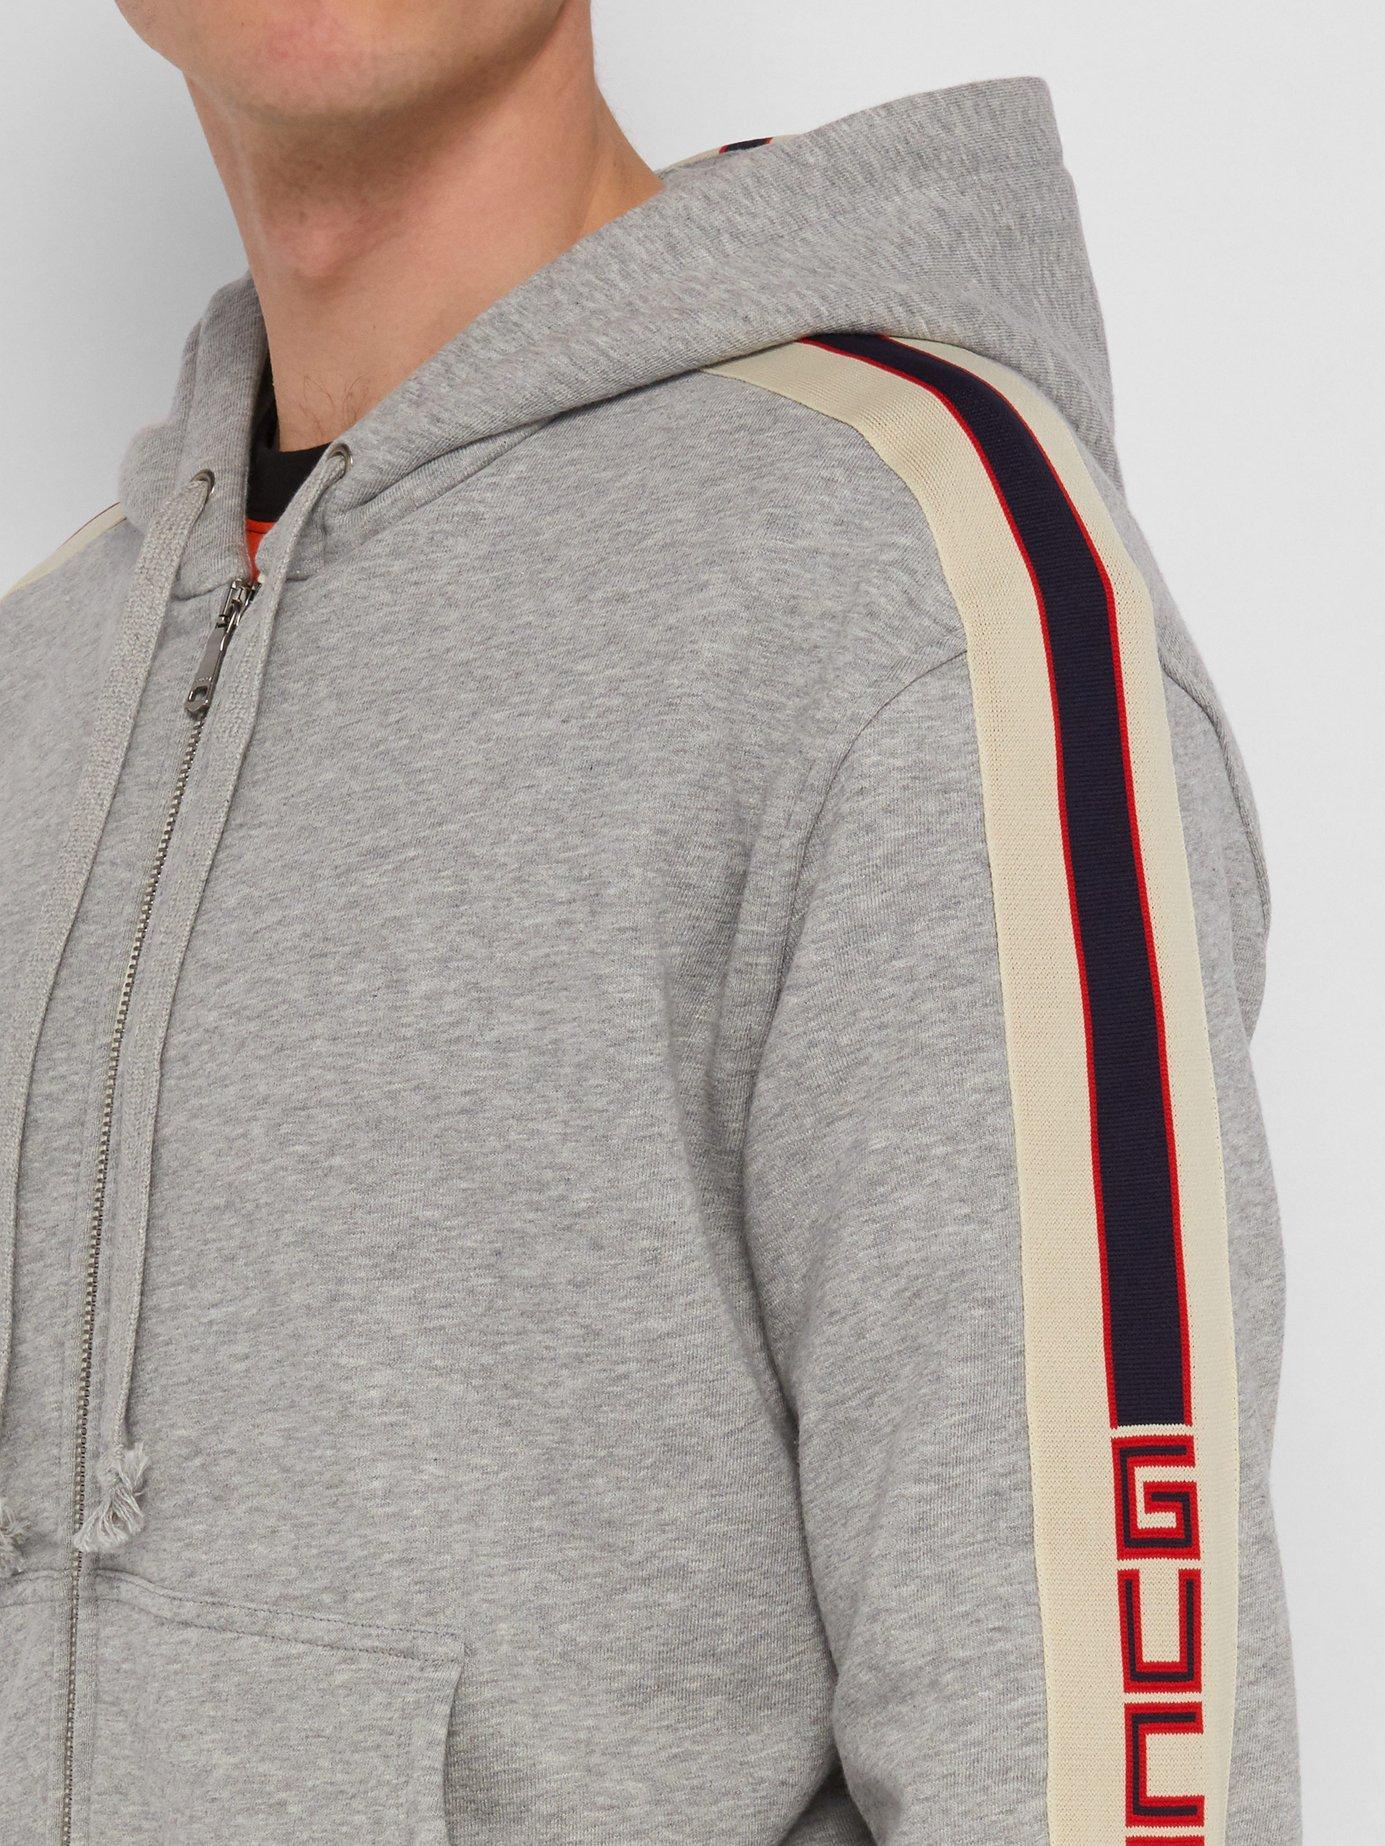 296ec51fdc1 Lyst - Gucci Logo Tape Zip Through Hooded Cotton Sweatshirt in Gray ...